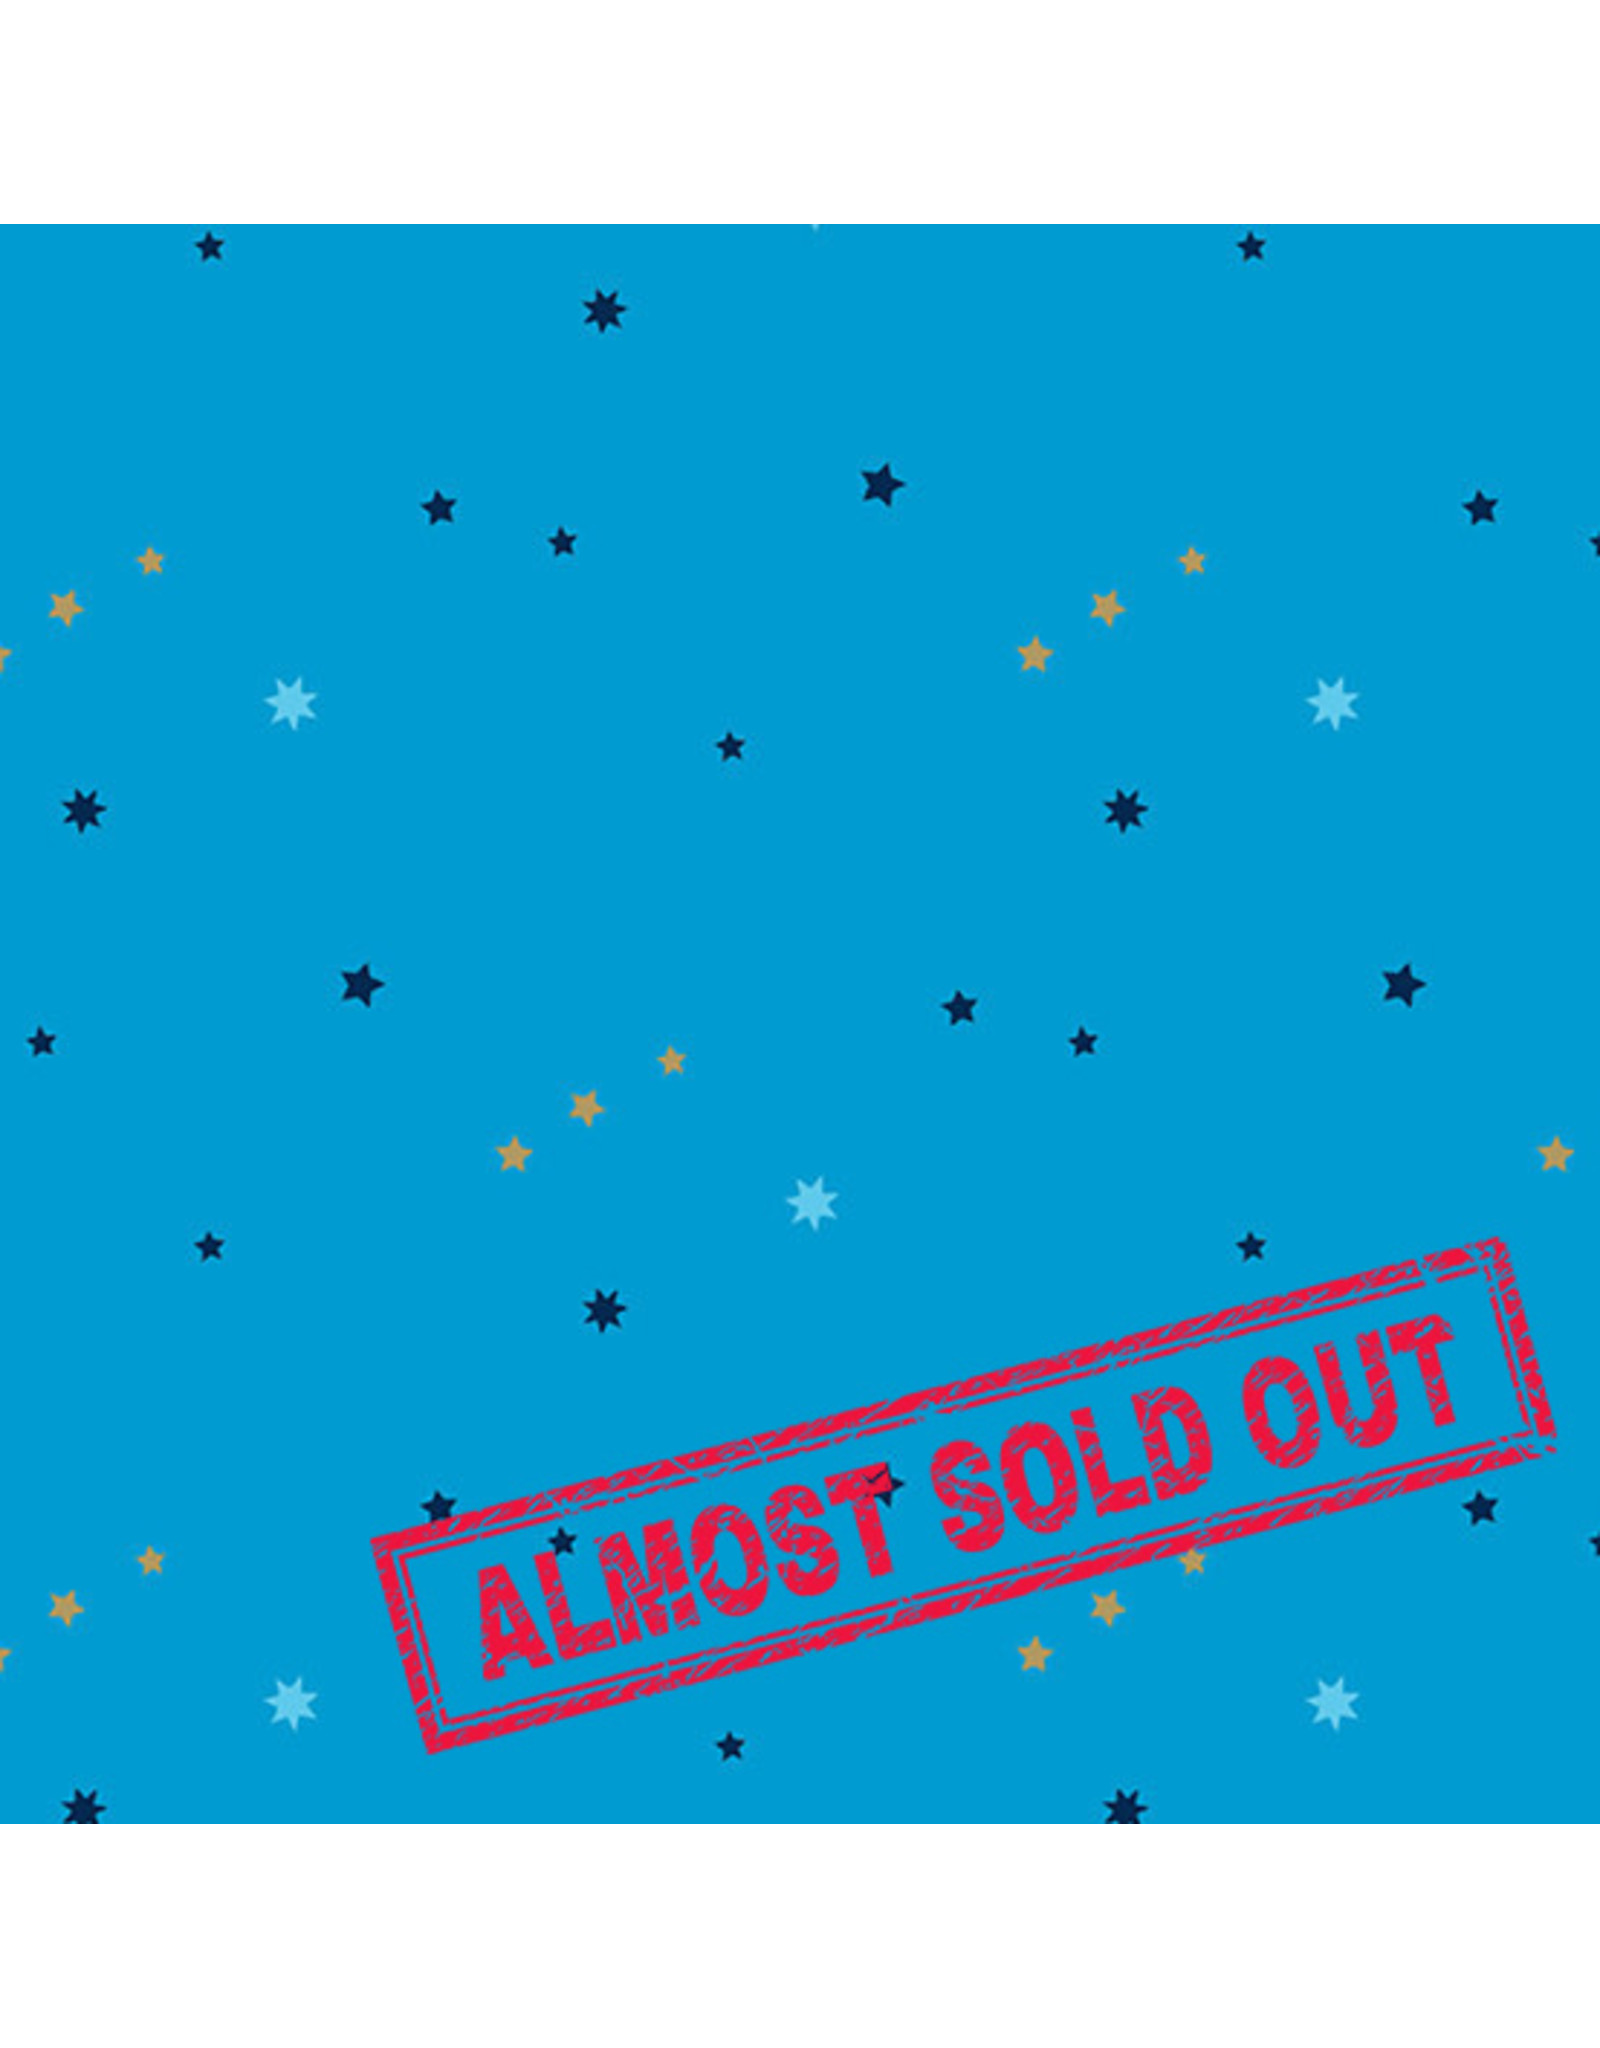 Andover Greatest Hits Vol 1 - Sunstars Blue